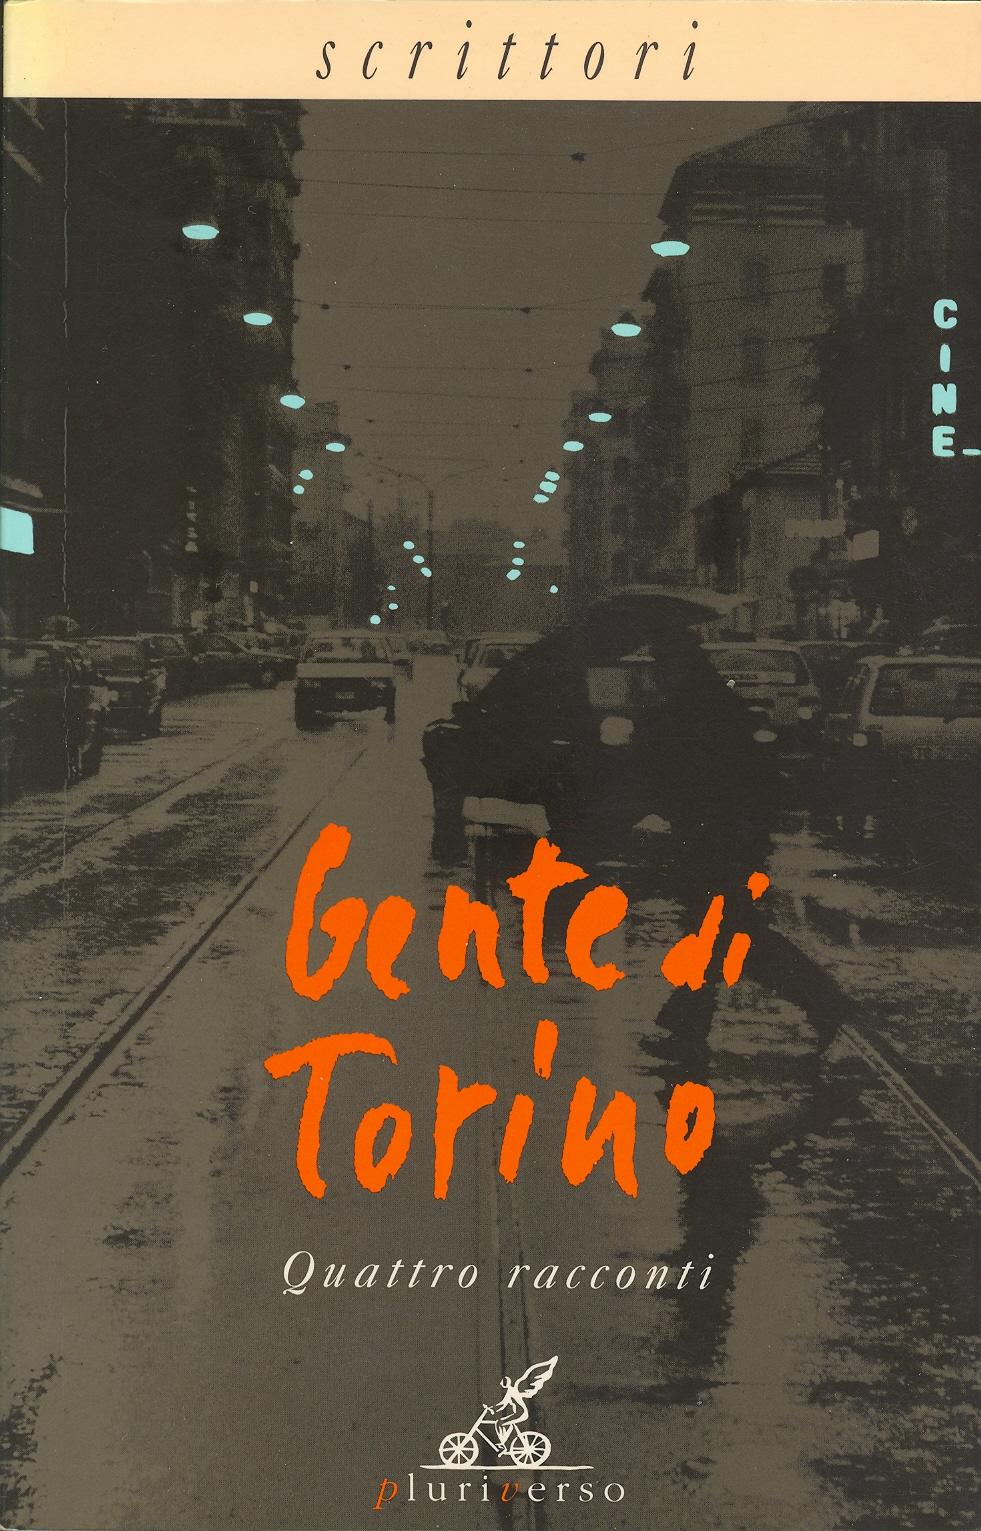 Gente di Torino